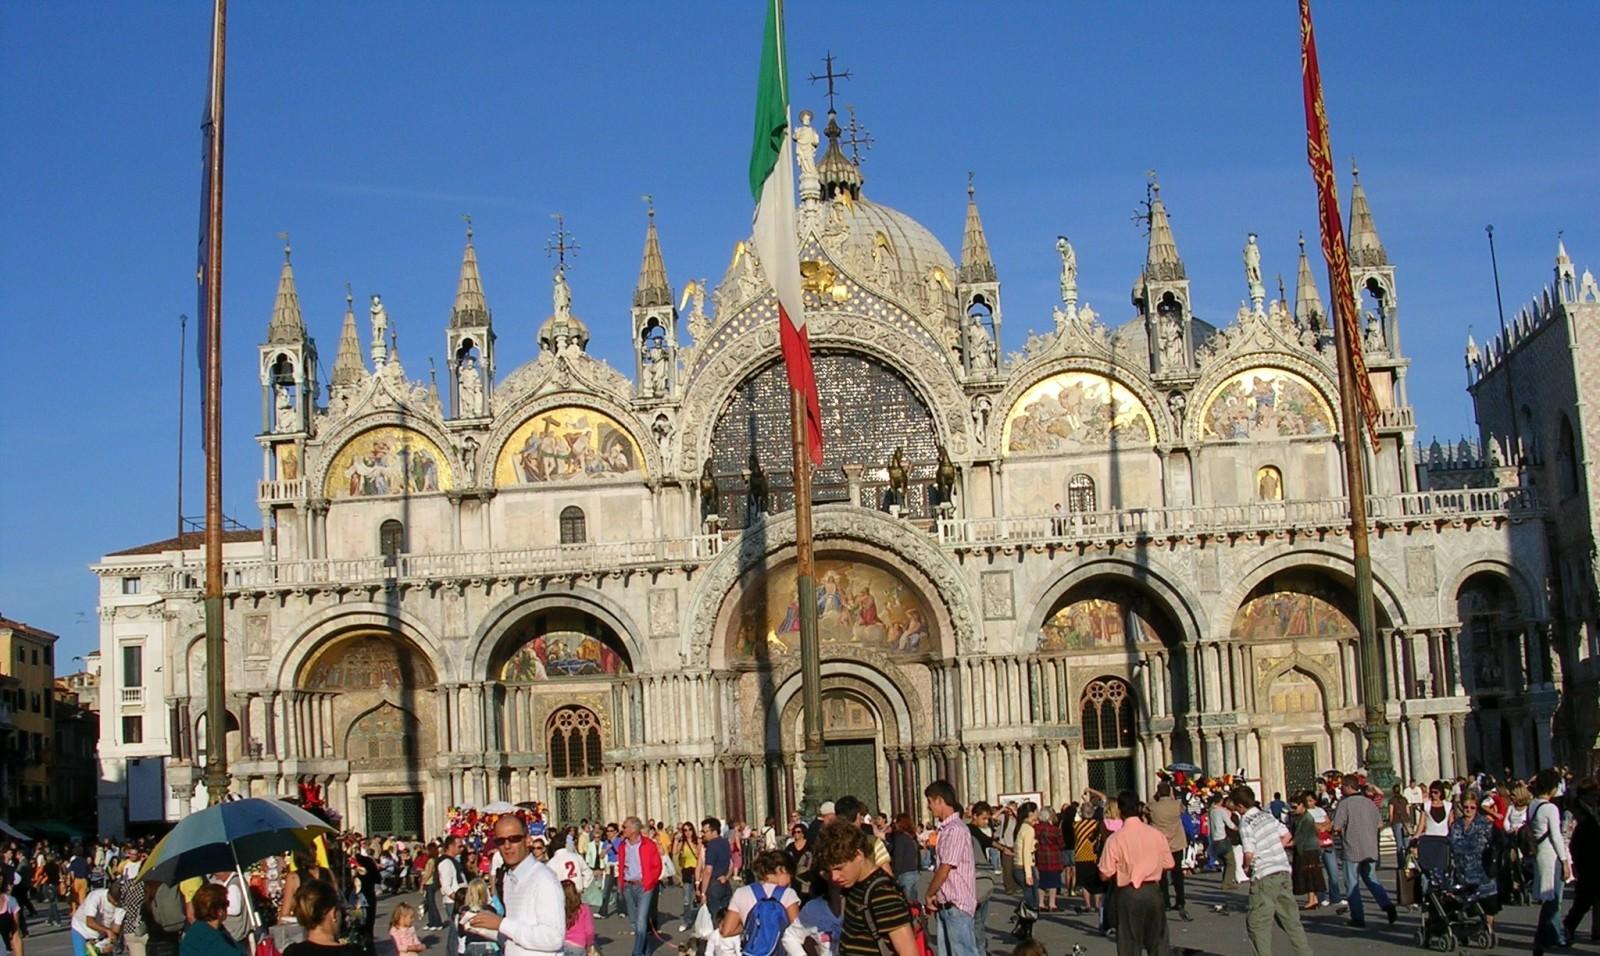 St Mark's Basilica